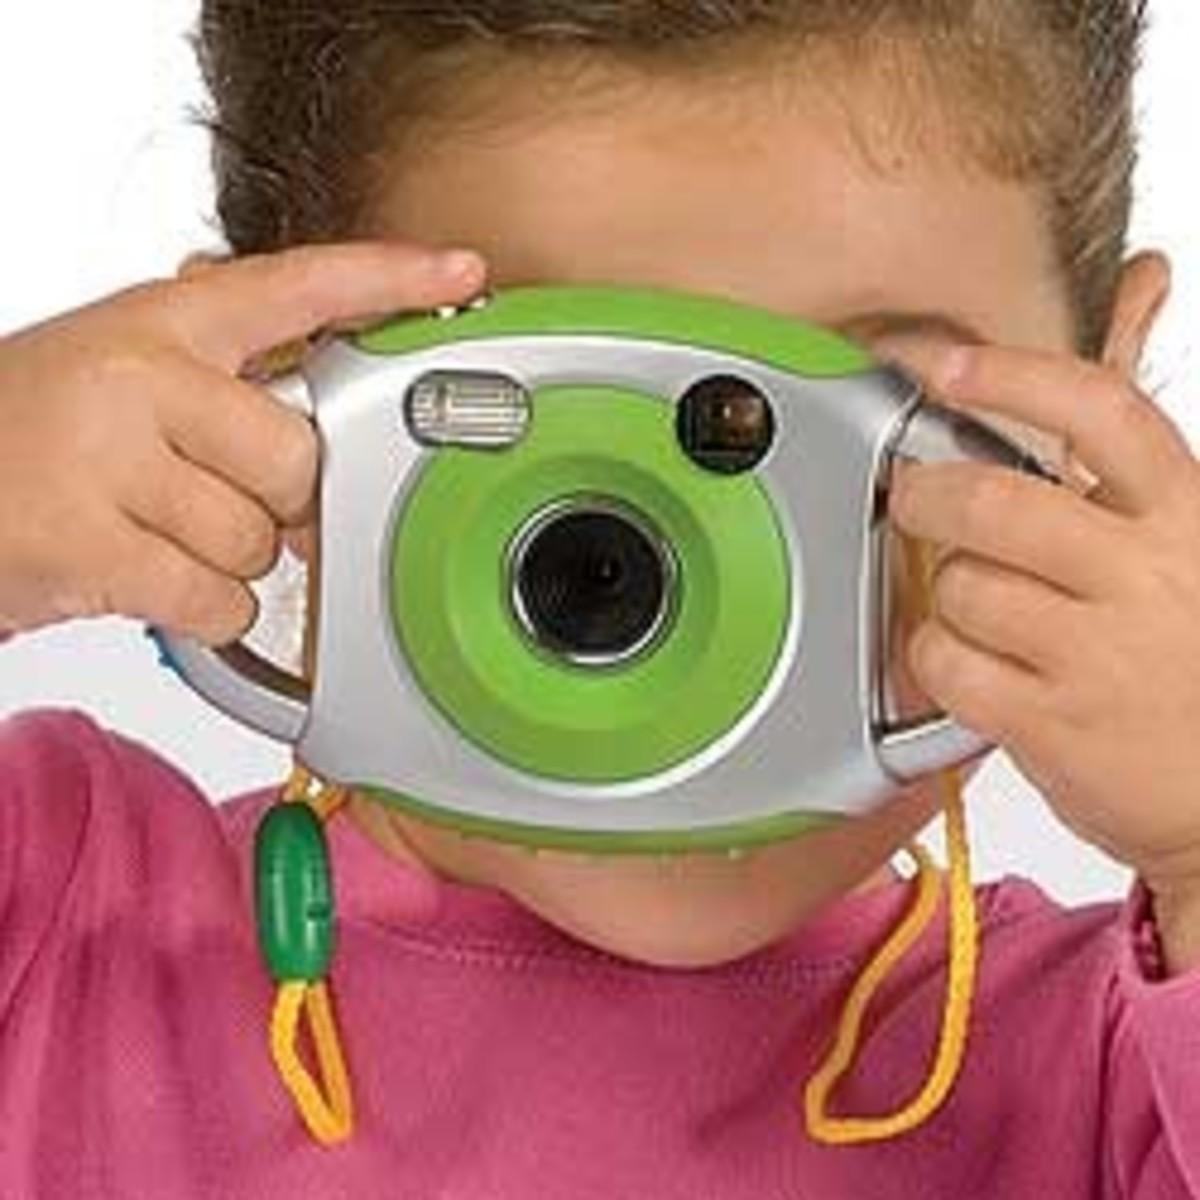 Thanksgiving kids photographer game